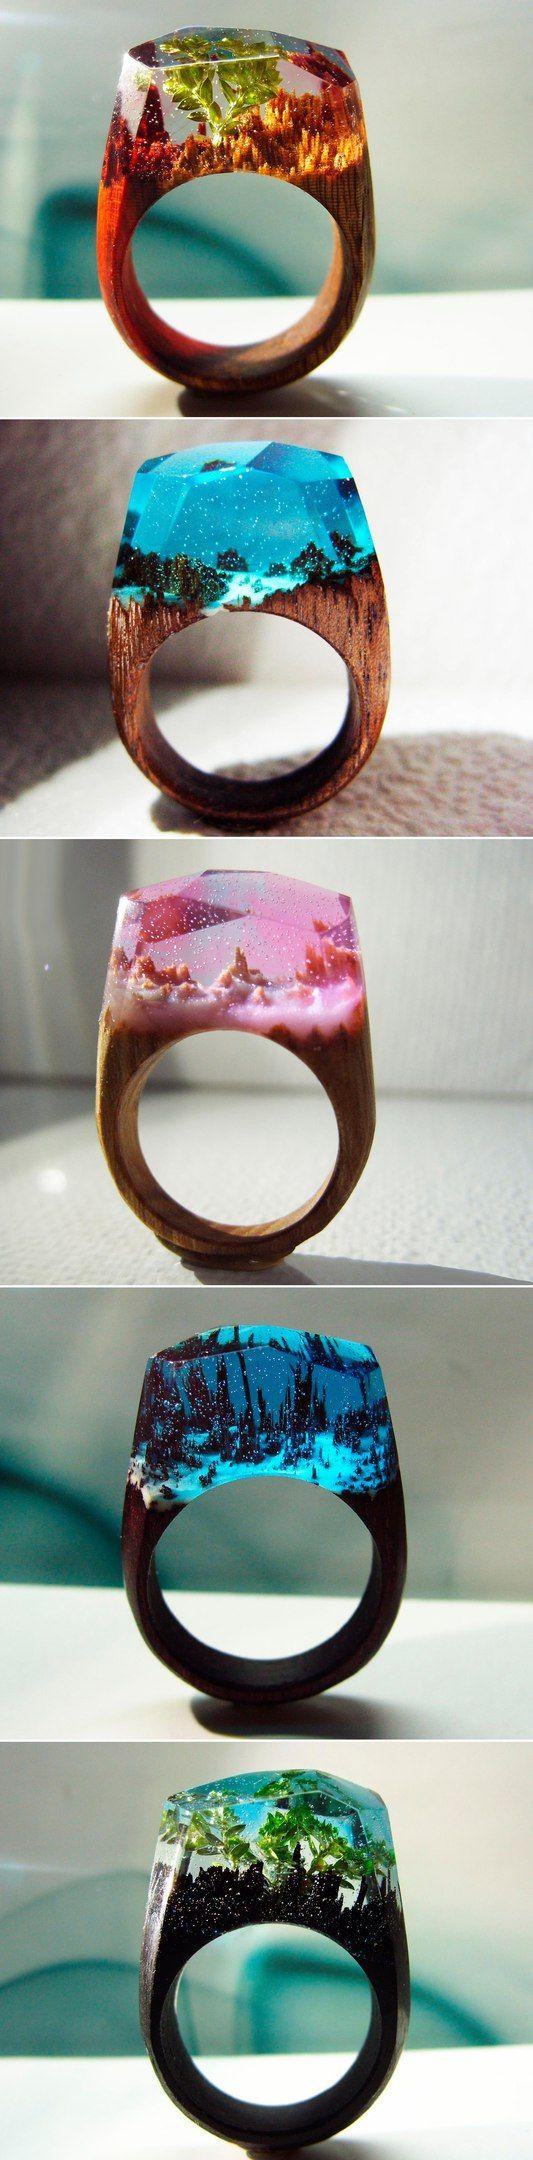 Wooden Rings | Деревянные кольца